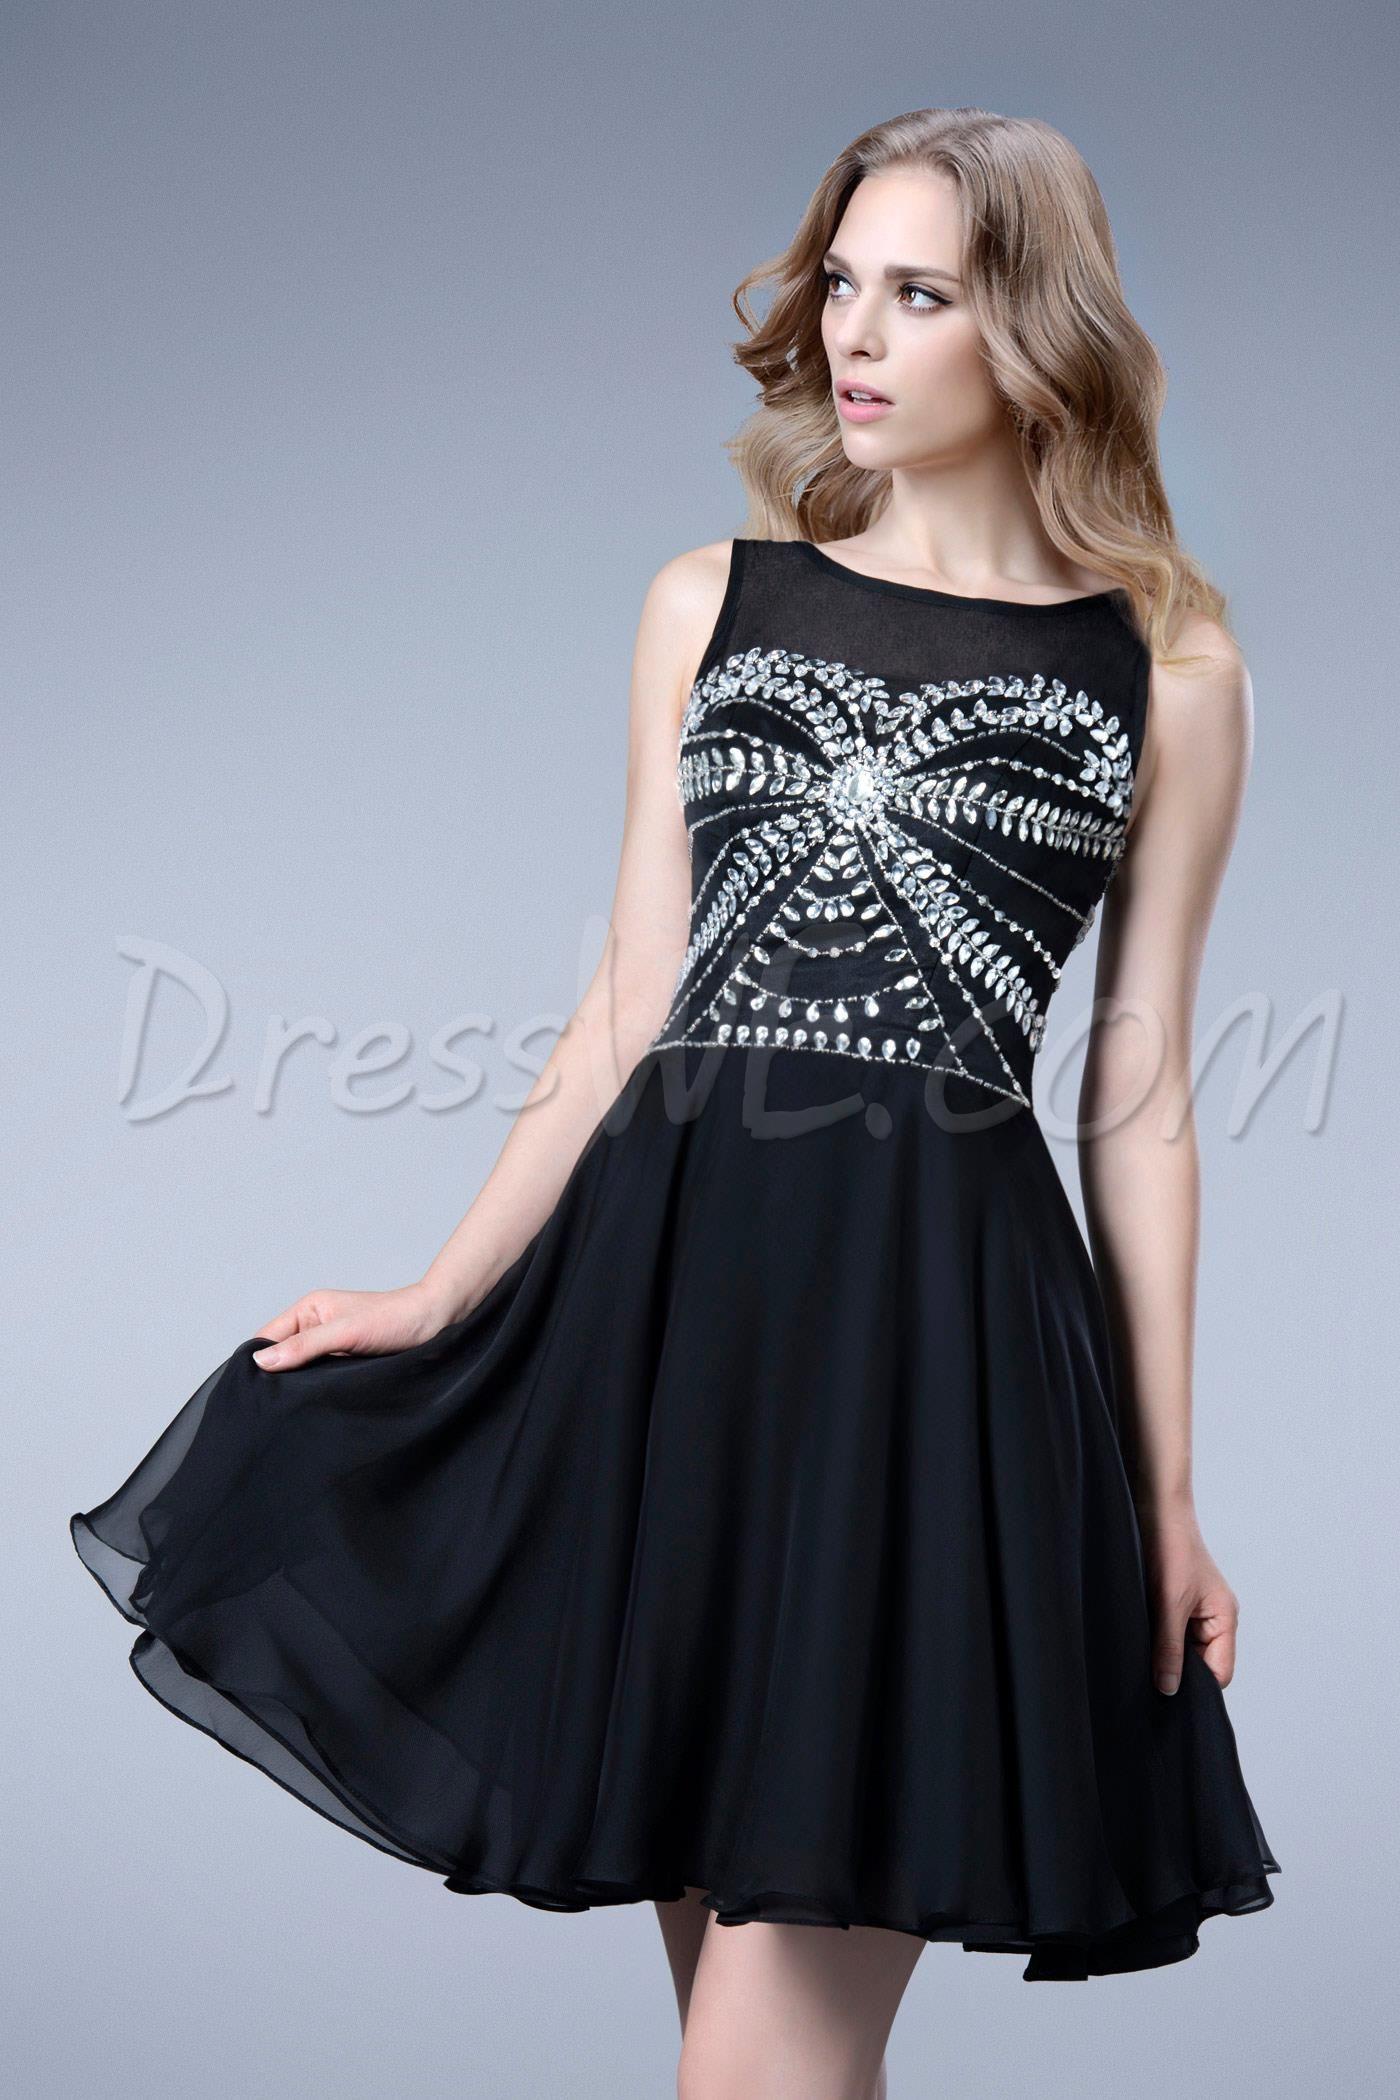 Dresswe SUPPLIES Attractive Beading ZipperUp Empire